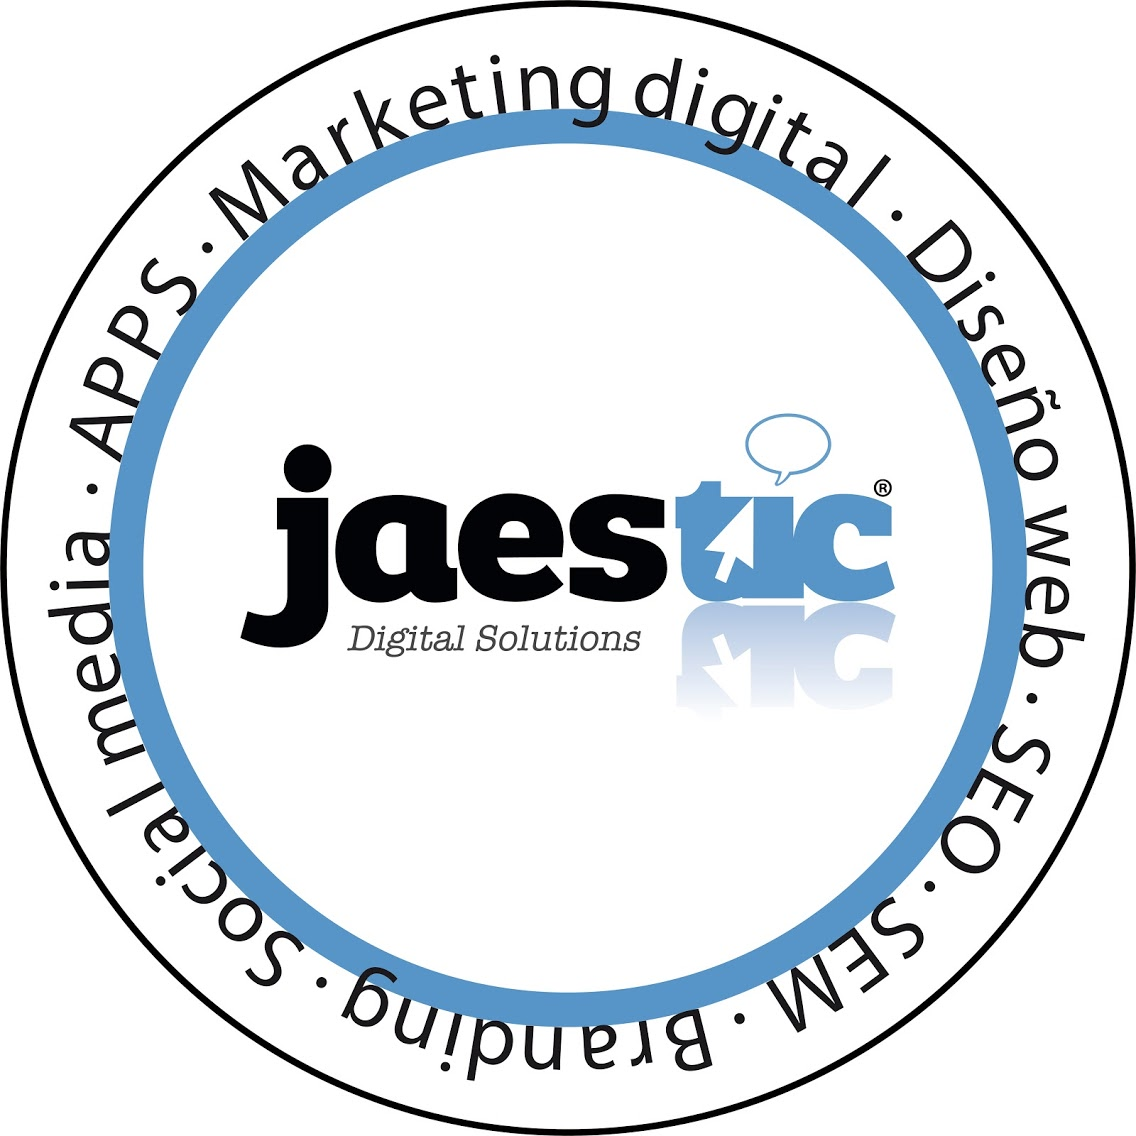 JAESTIC - Digital Solutions